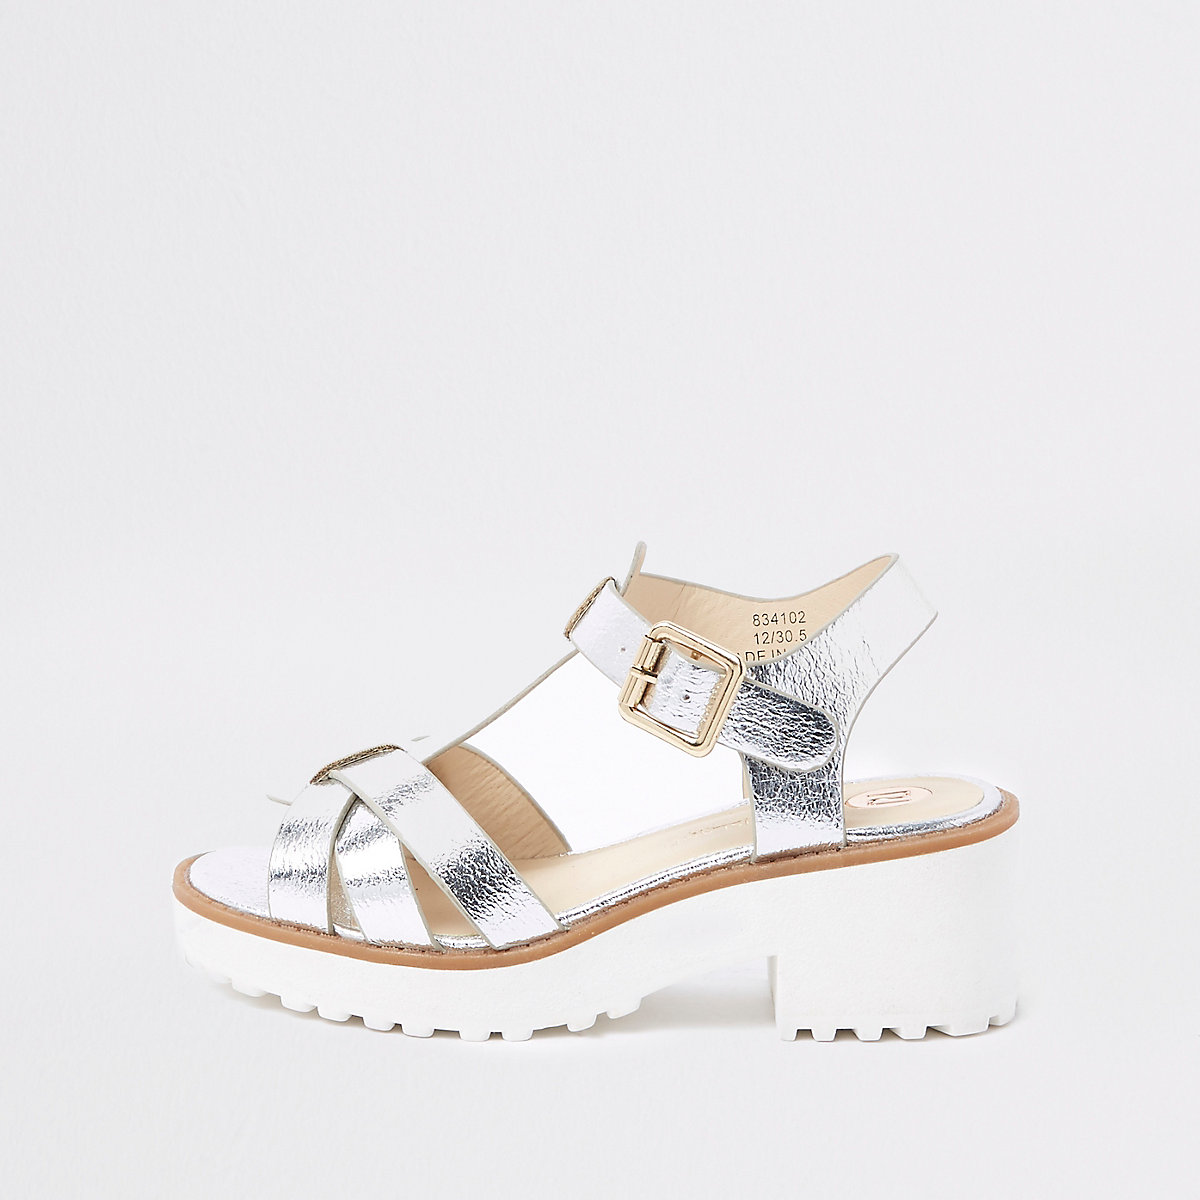 Girls silver metallic clumpy sandals